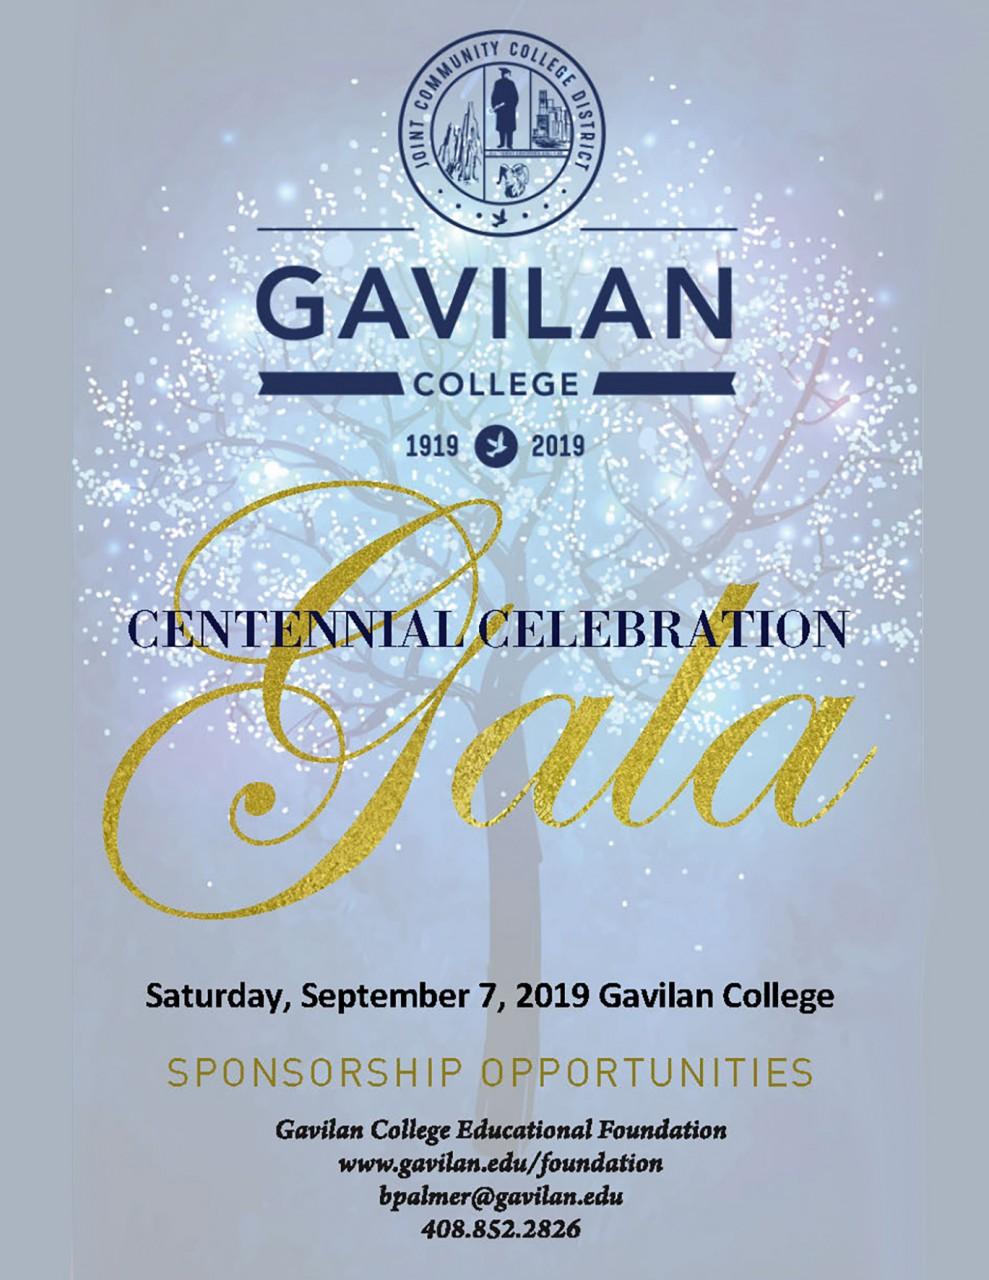 Flyer courtesy of Gavilan College website.